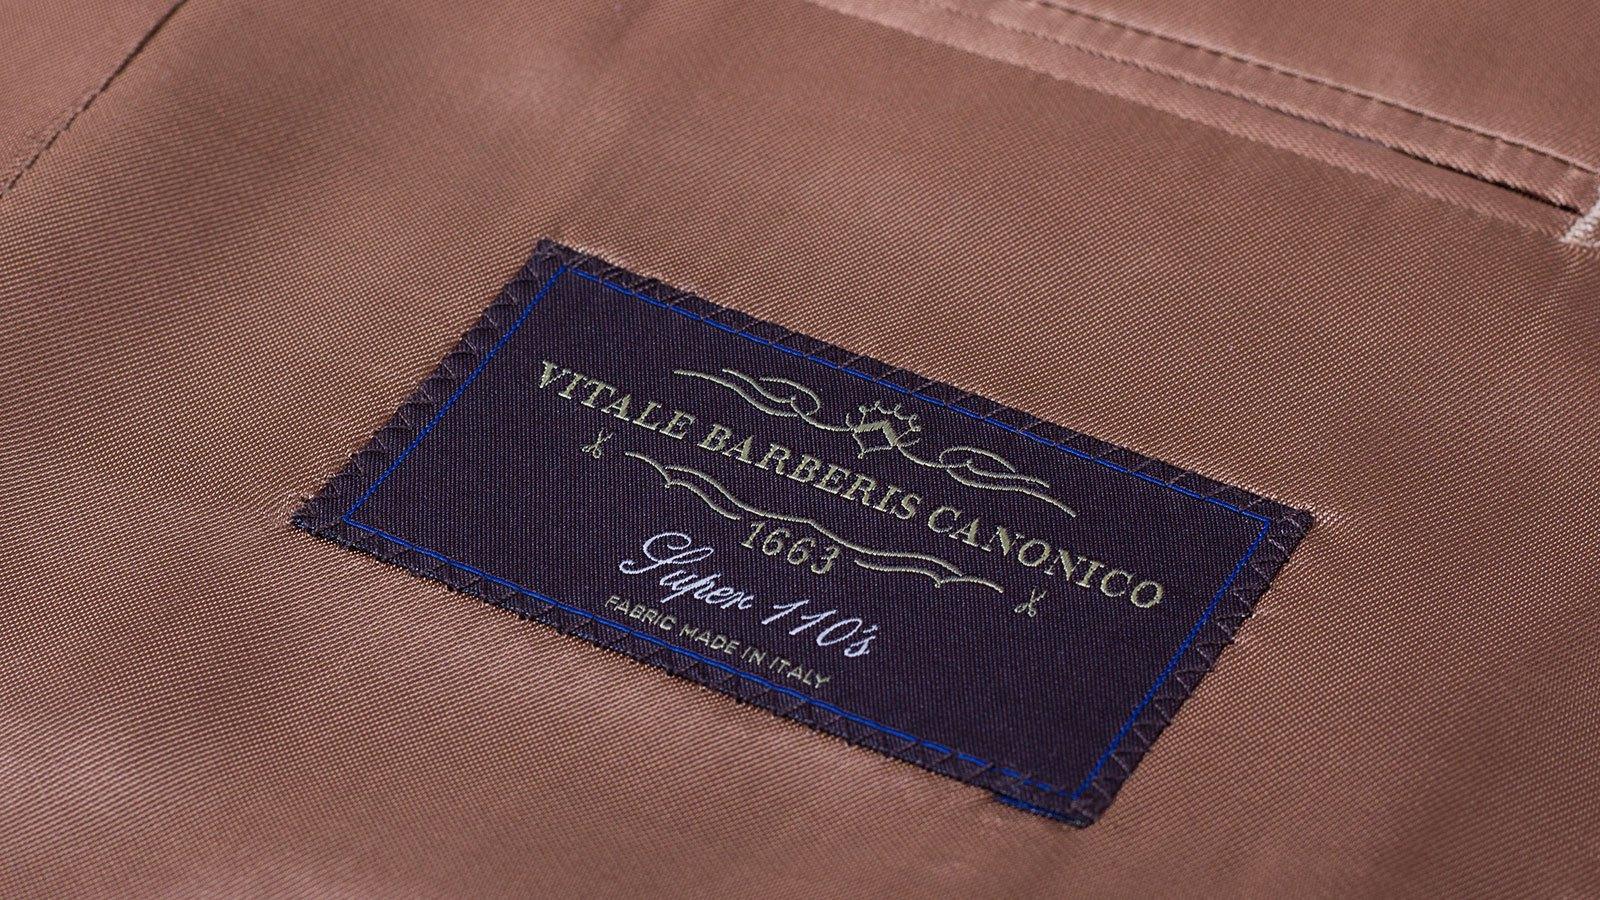 1663 Black Tuxedo with peak lapels - slider image 1